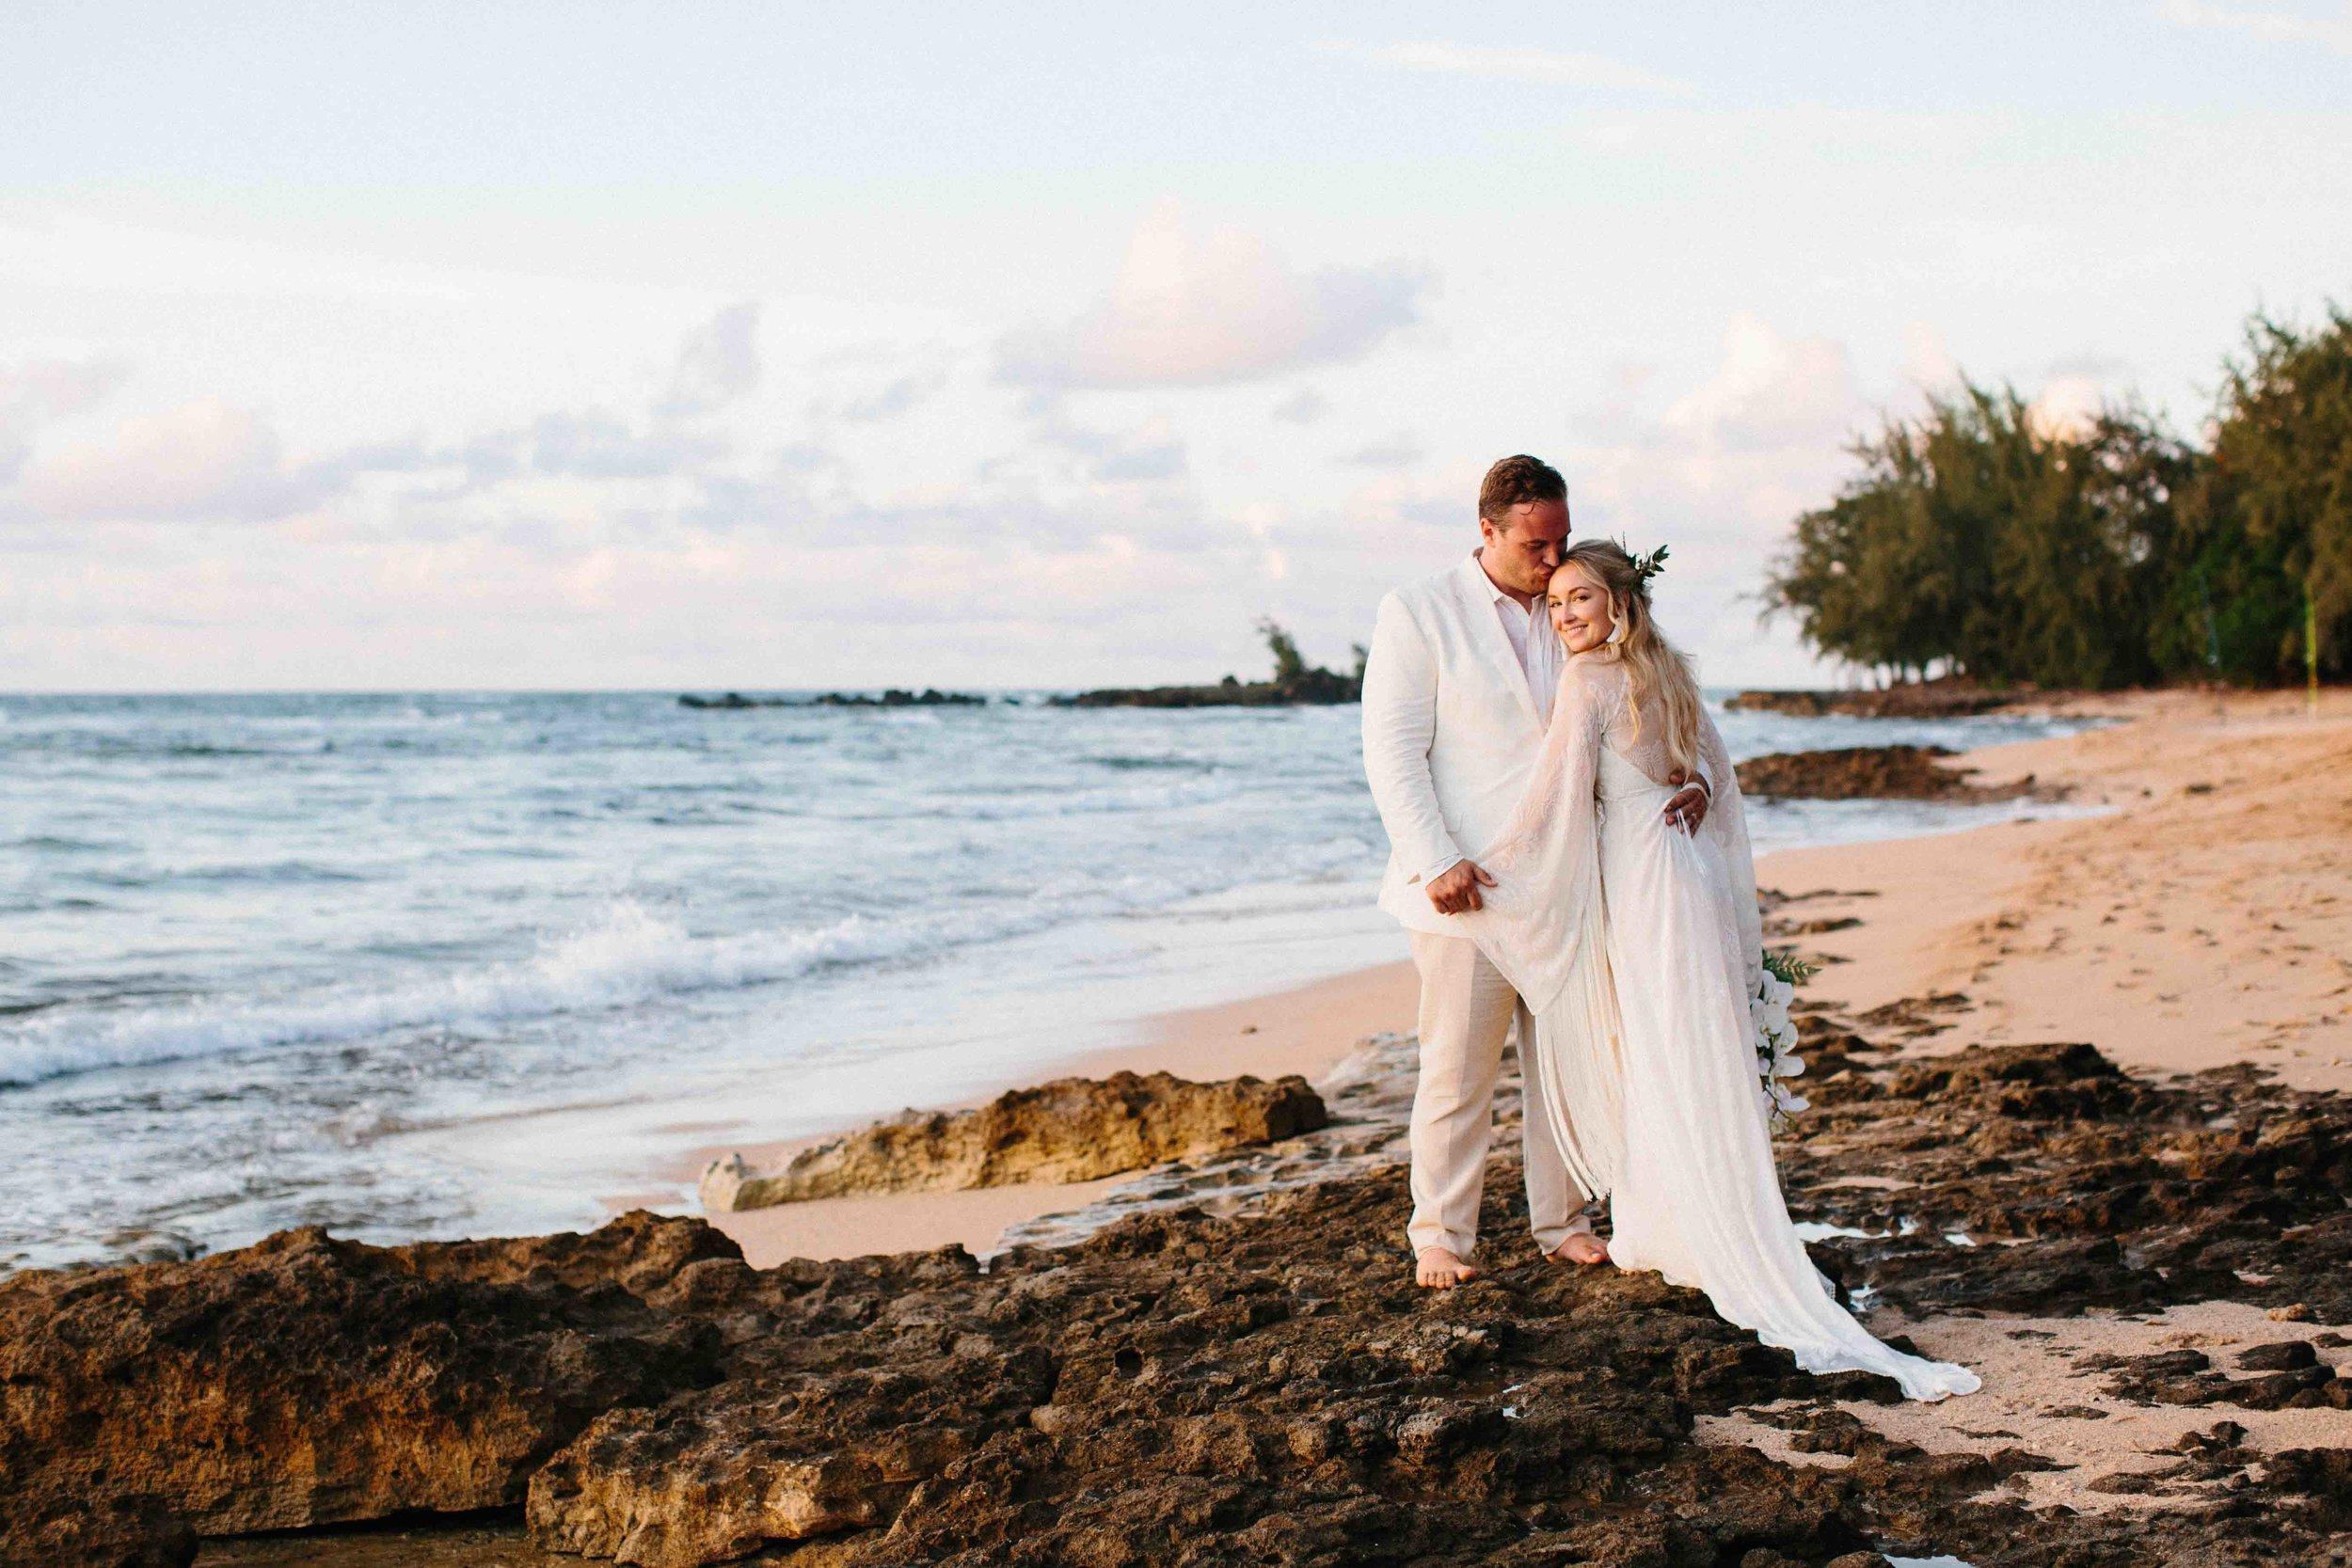 Oahu Beach Wedding Photography of Bride and Groom